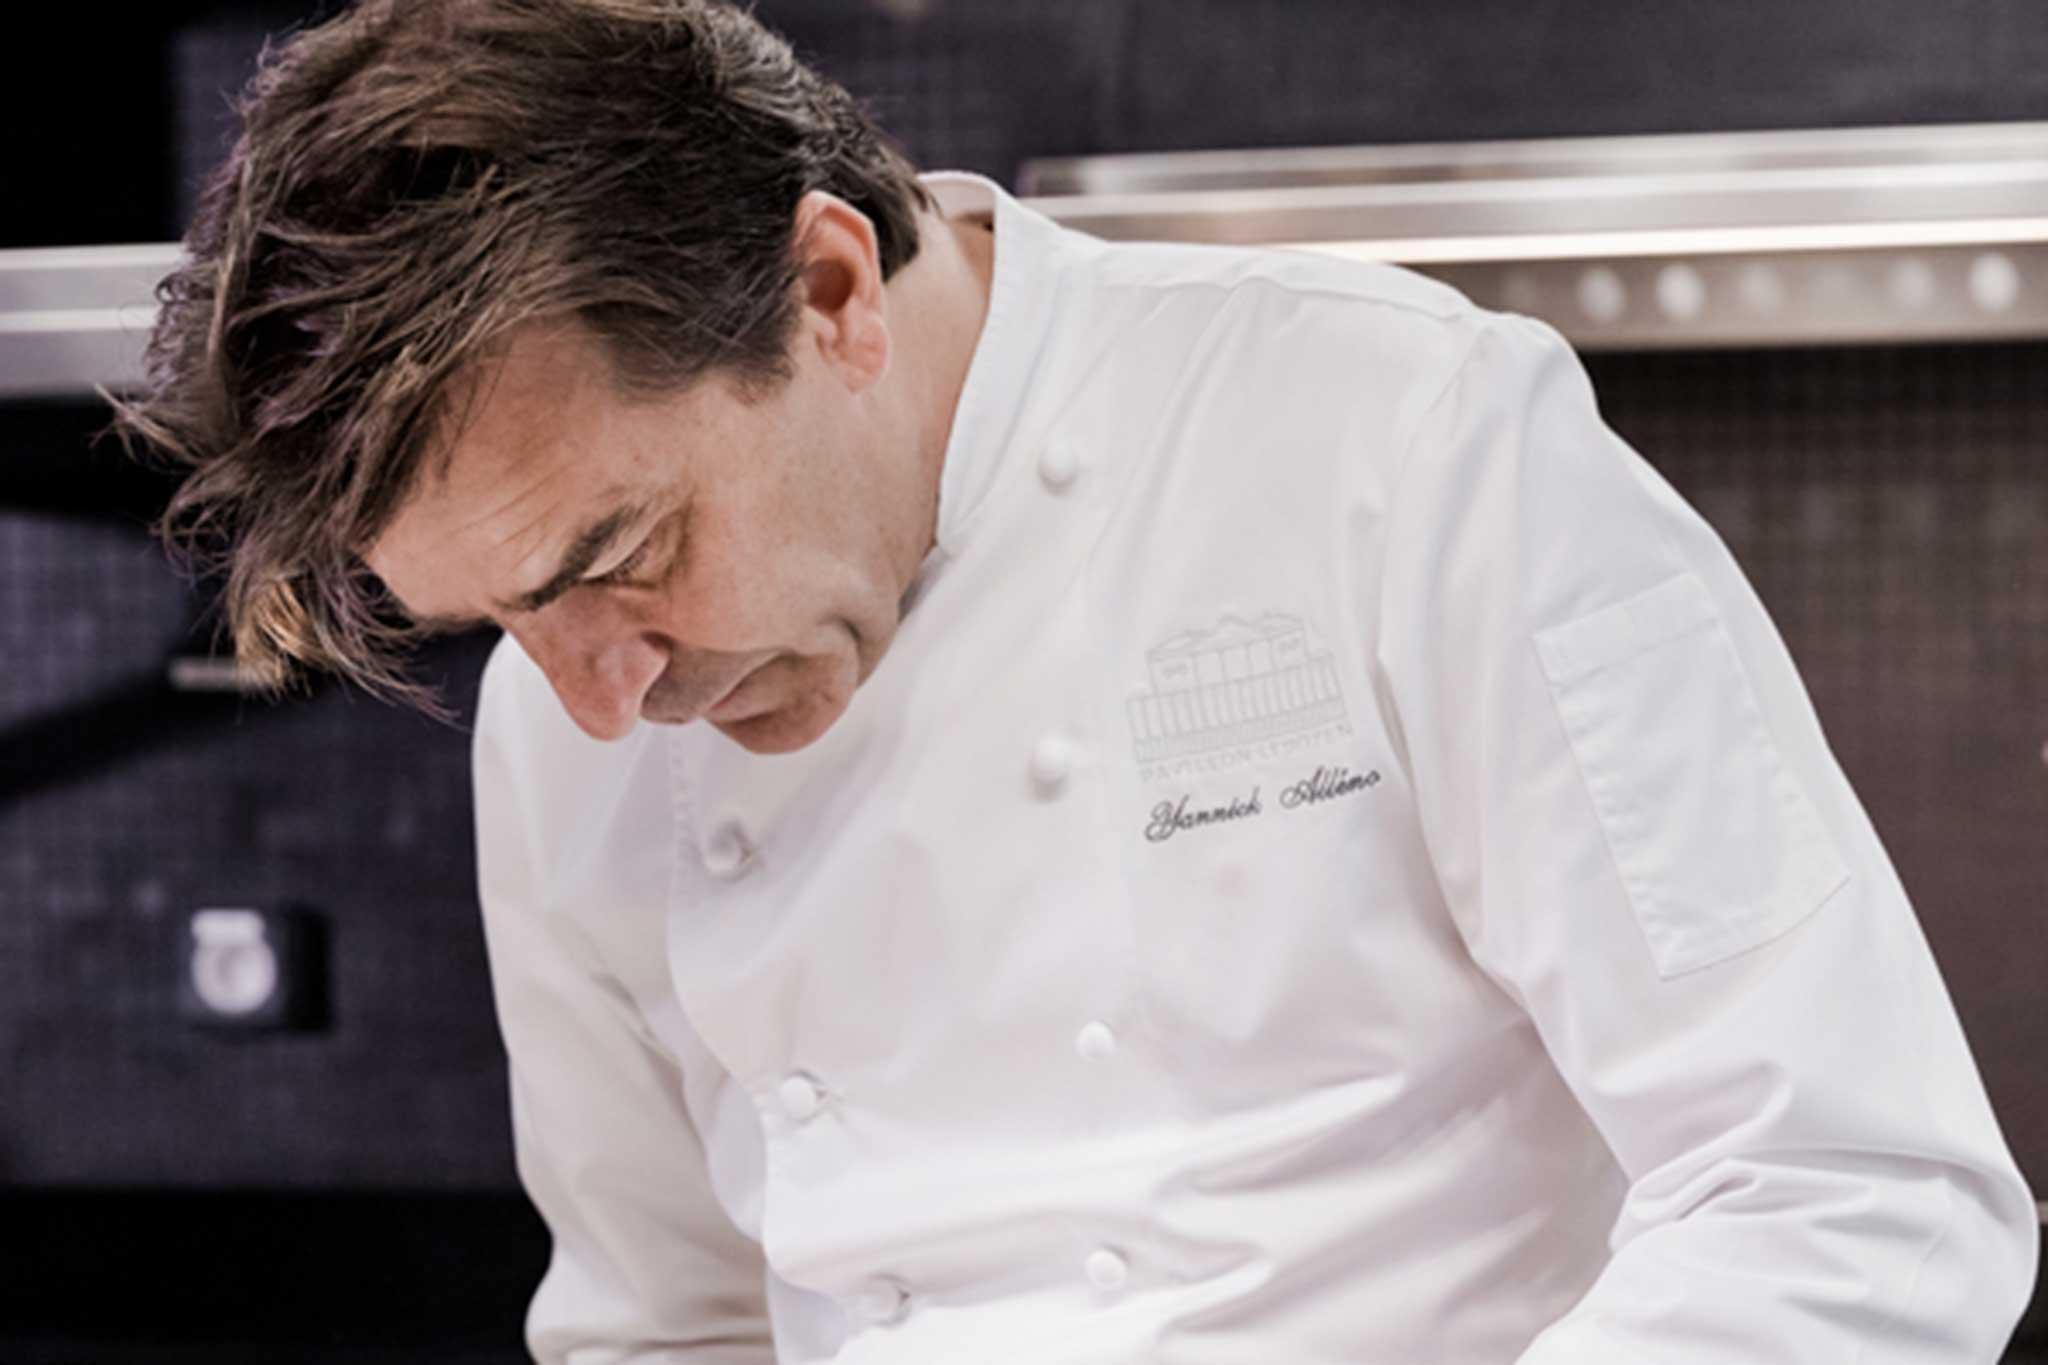 Chef Spotlight: Yannick Alléno